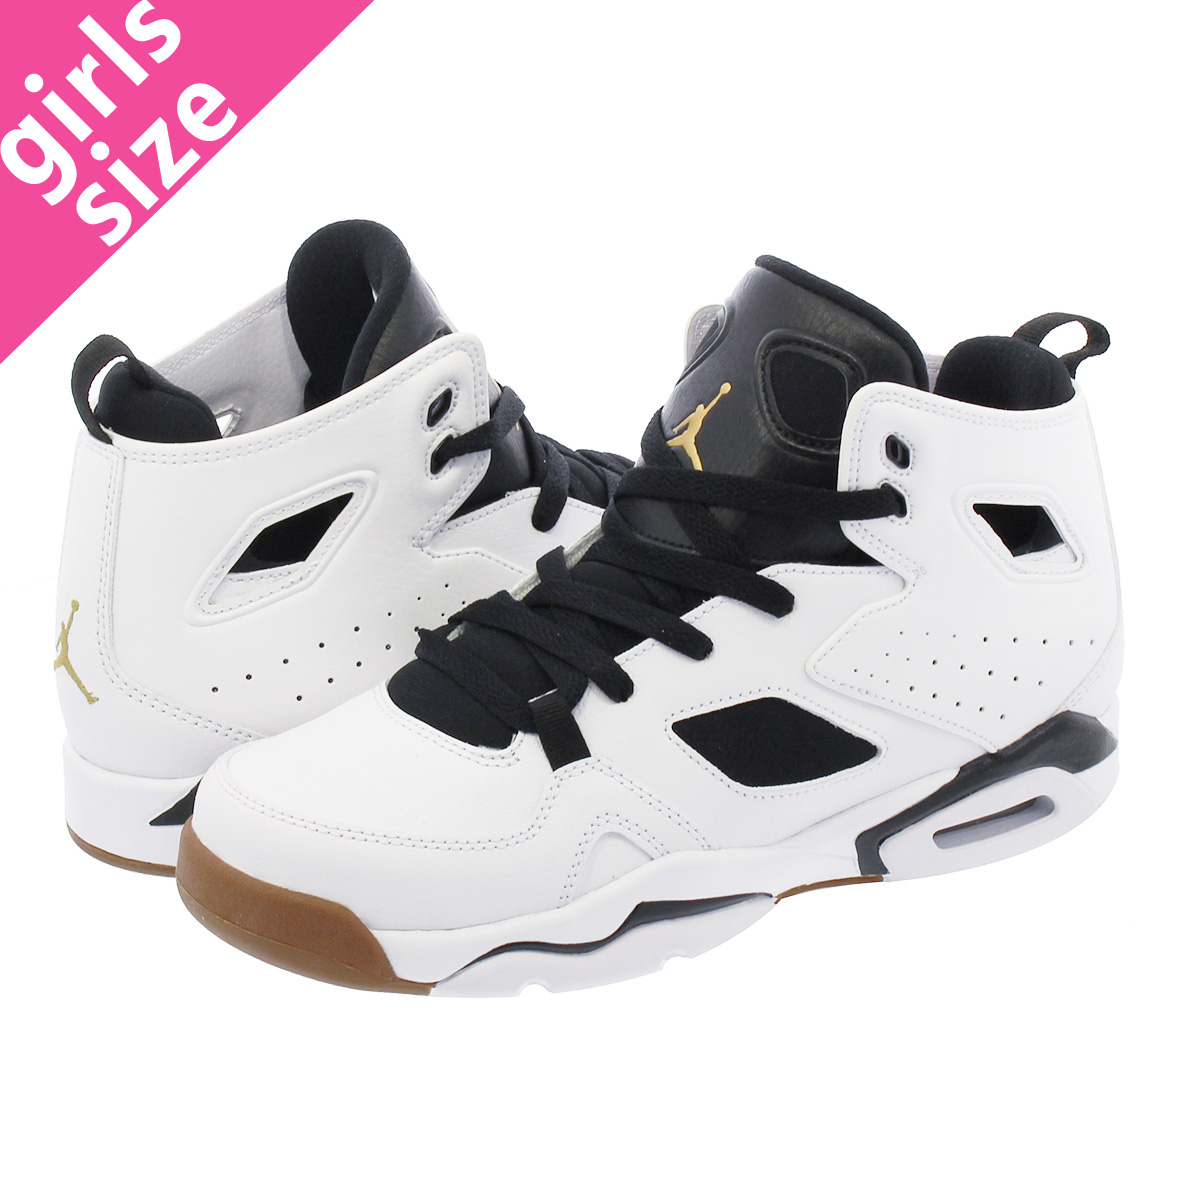 NIKE JORDAN FLIGHT CLUB 91 GG Nike Jordan flight club 91 GG  WHITE BLACK GOLD 555 5481821f8a